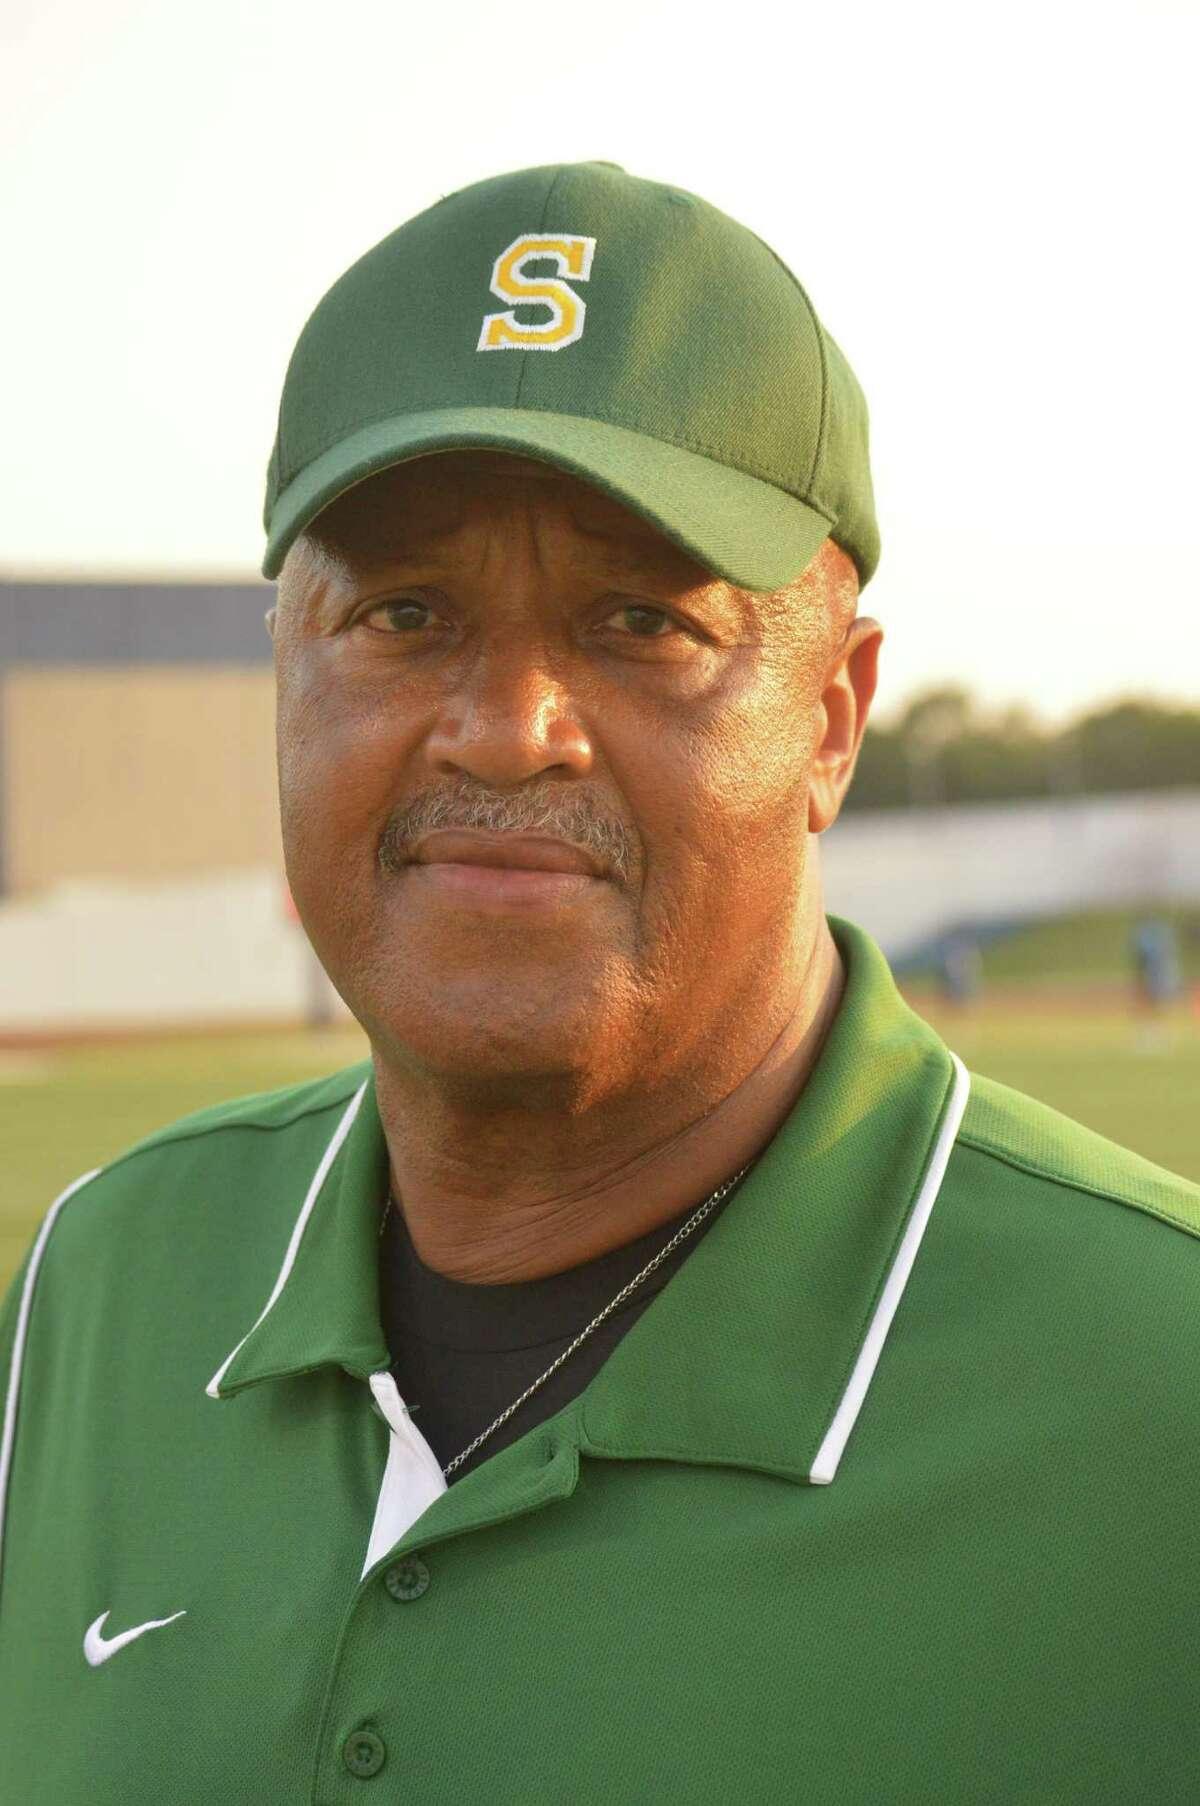 Charles Perridon coach of the Sharpstown High School football team.